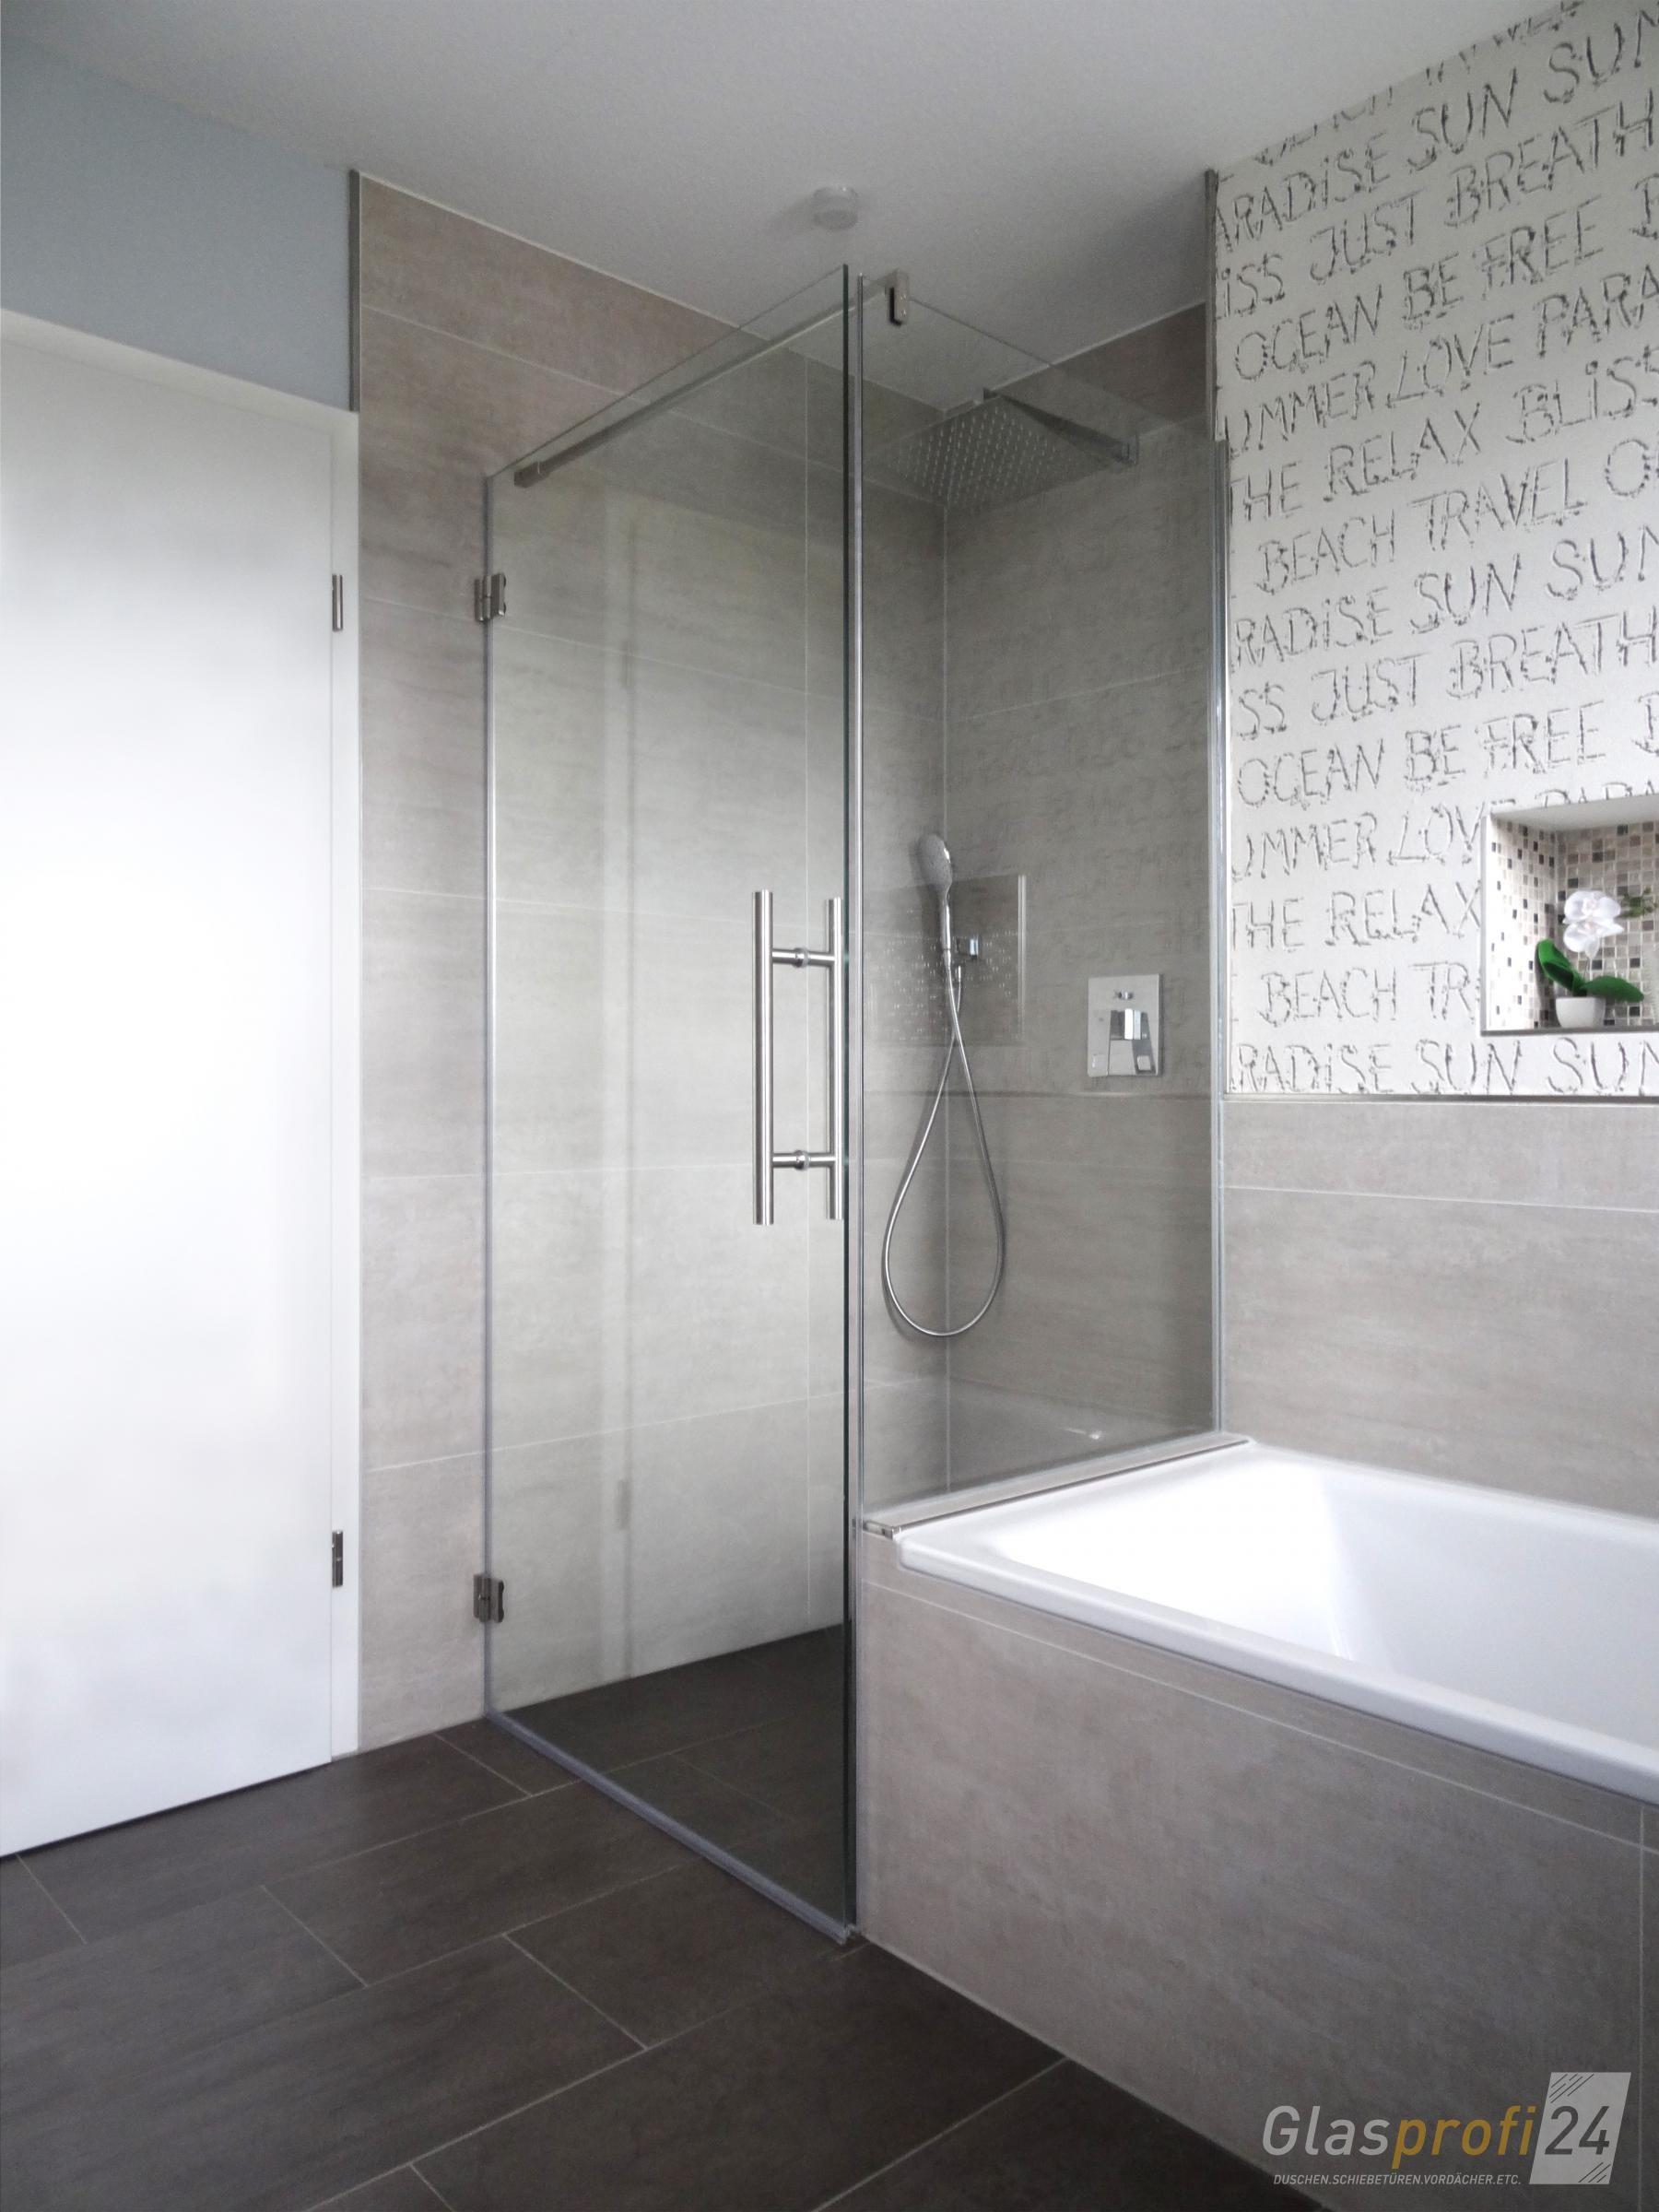 duschkabine an badewanne 90x90 Badkamer modern, Moderne